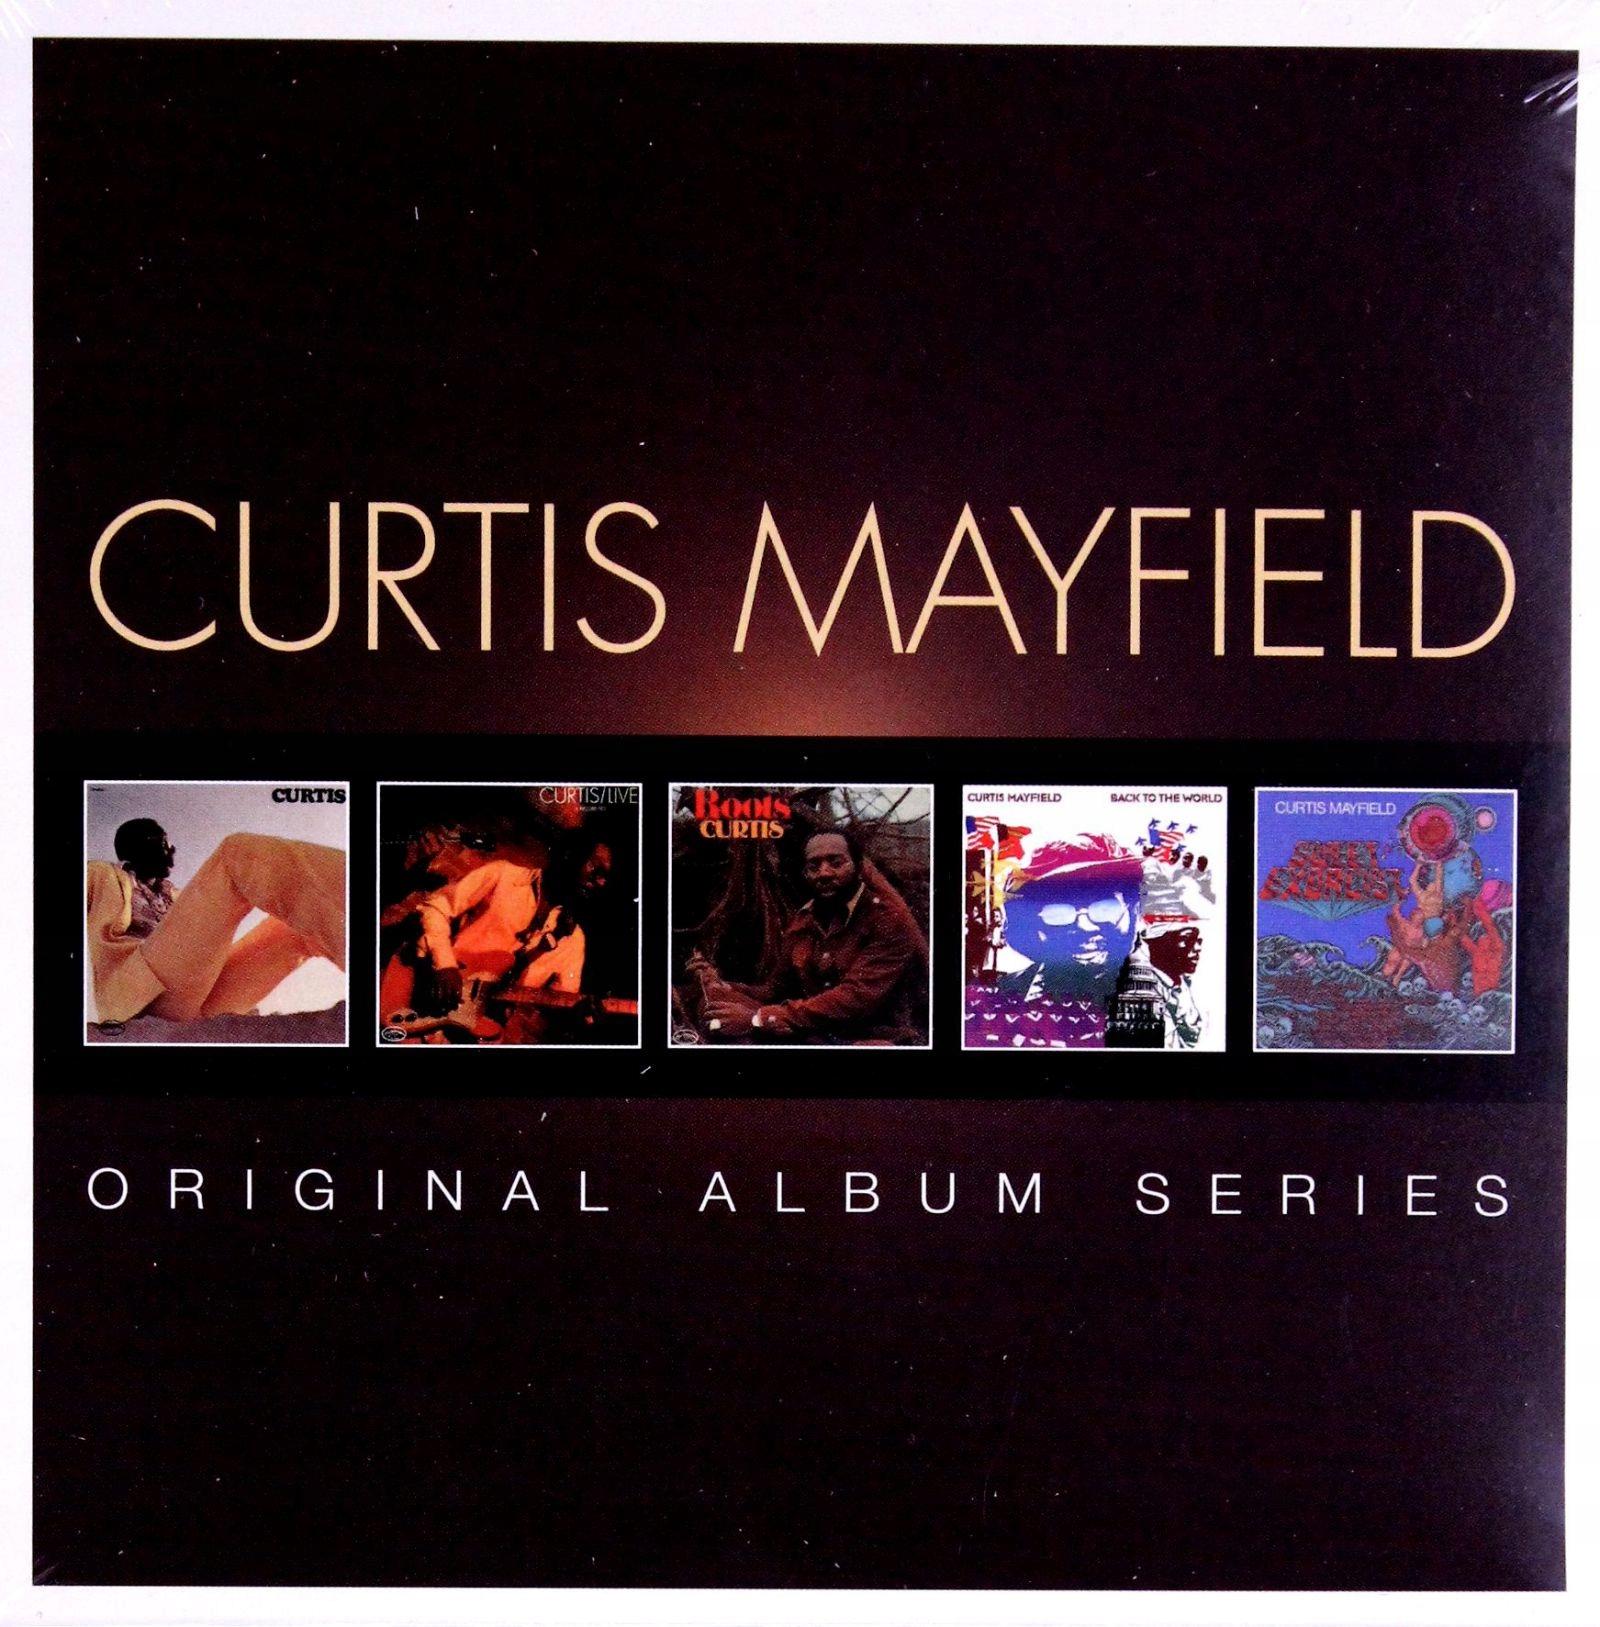 CURTIS MAYFIELD: ORIGINAL ALBUM SERIES [5CD]